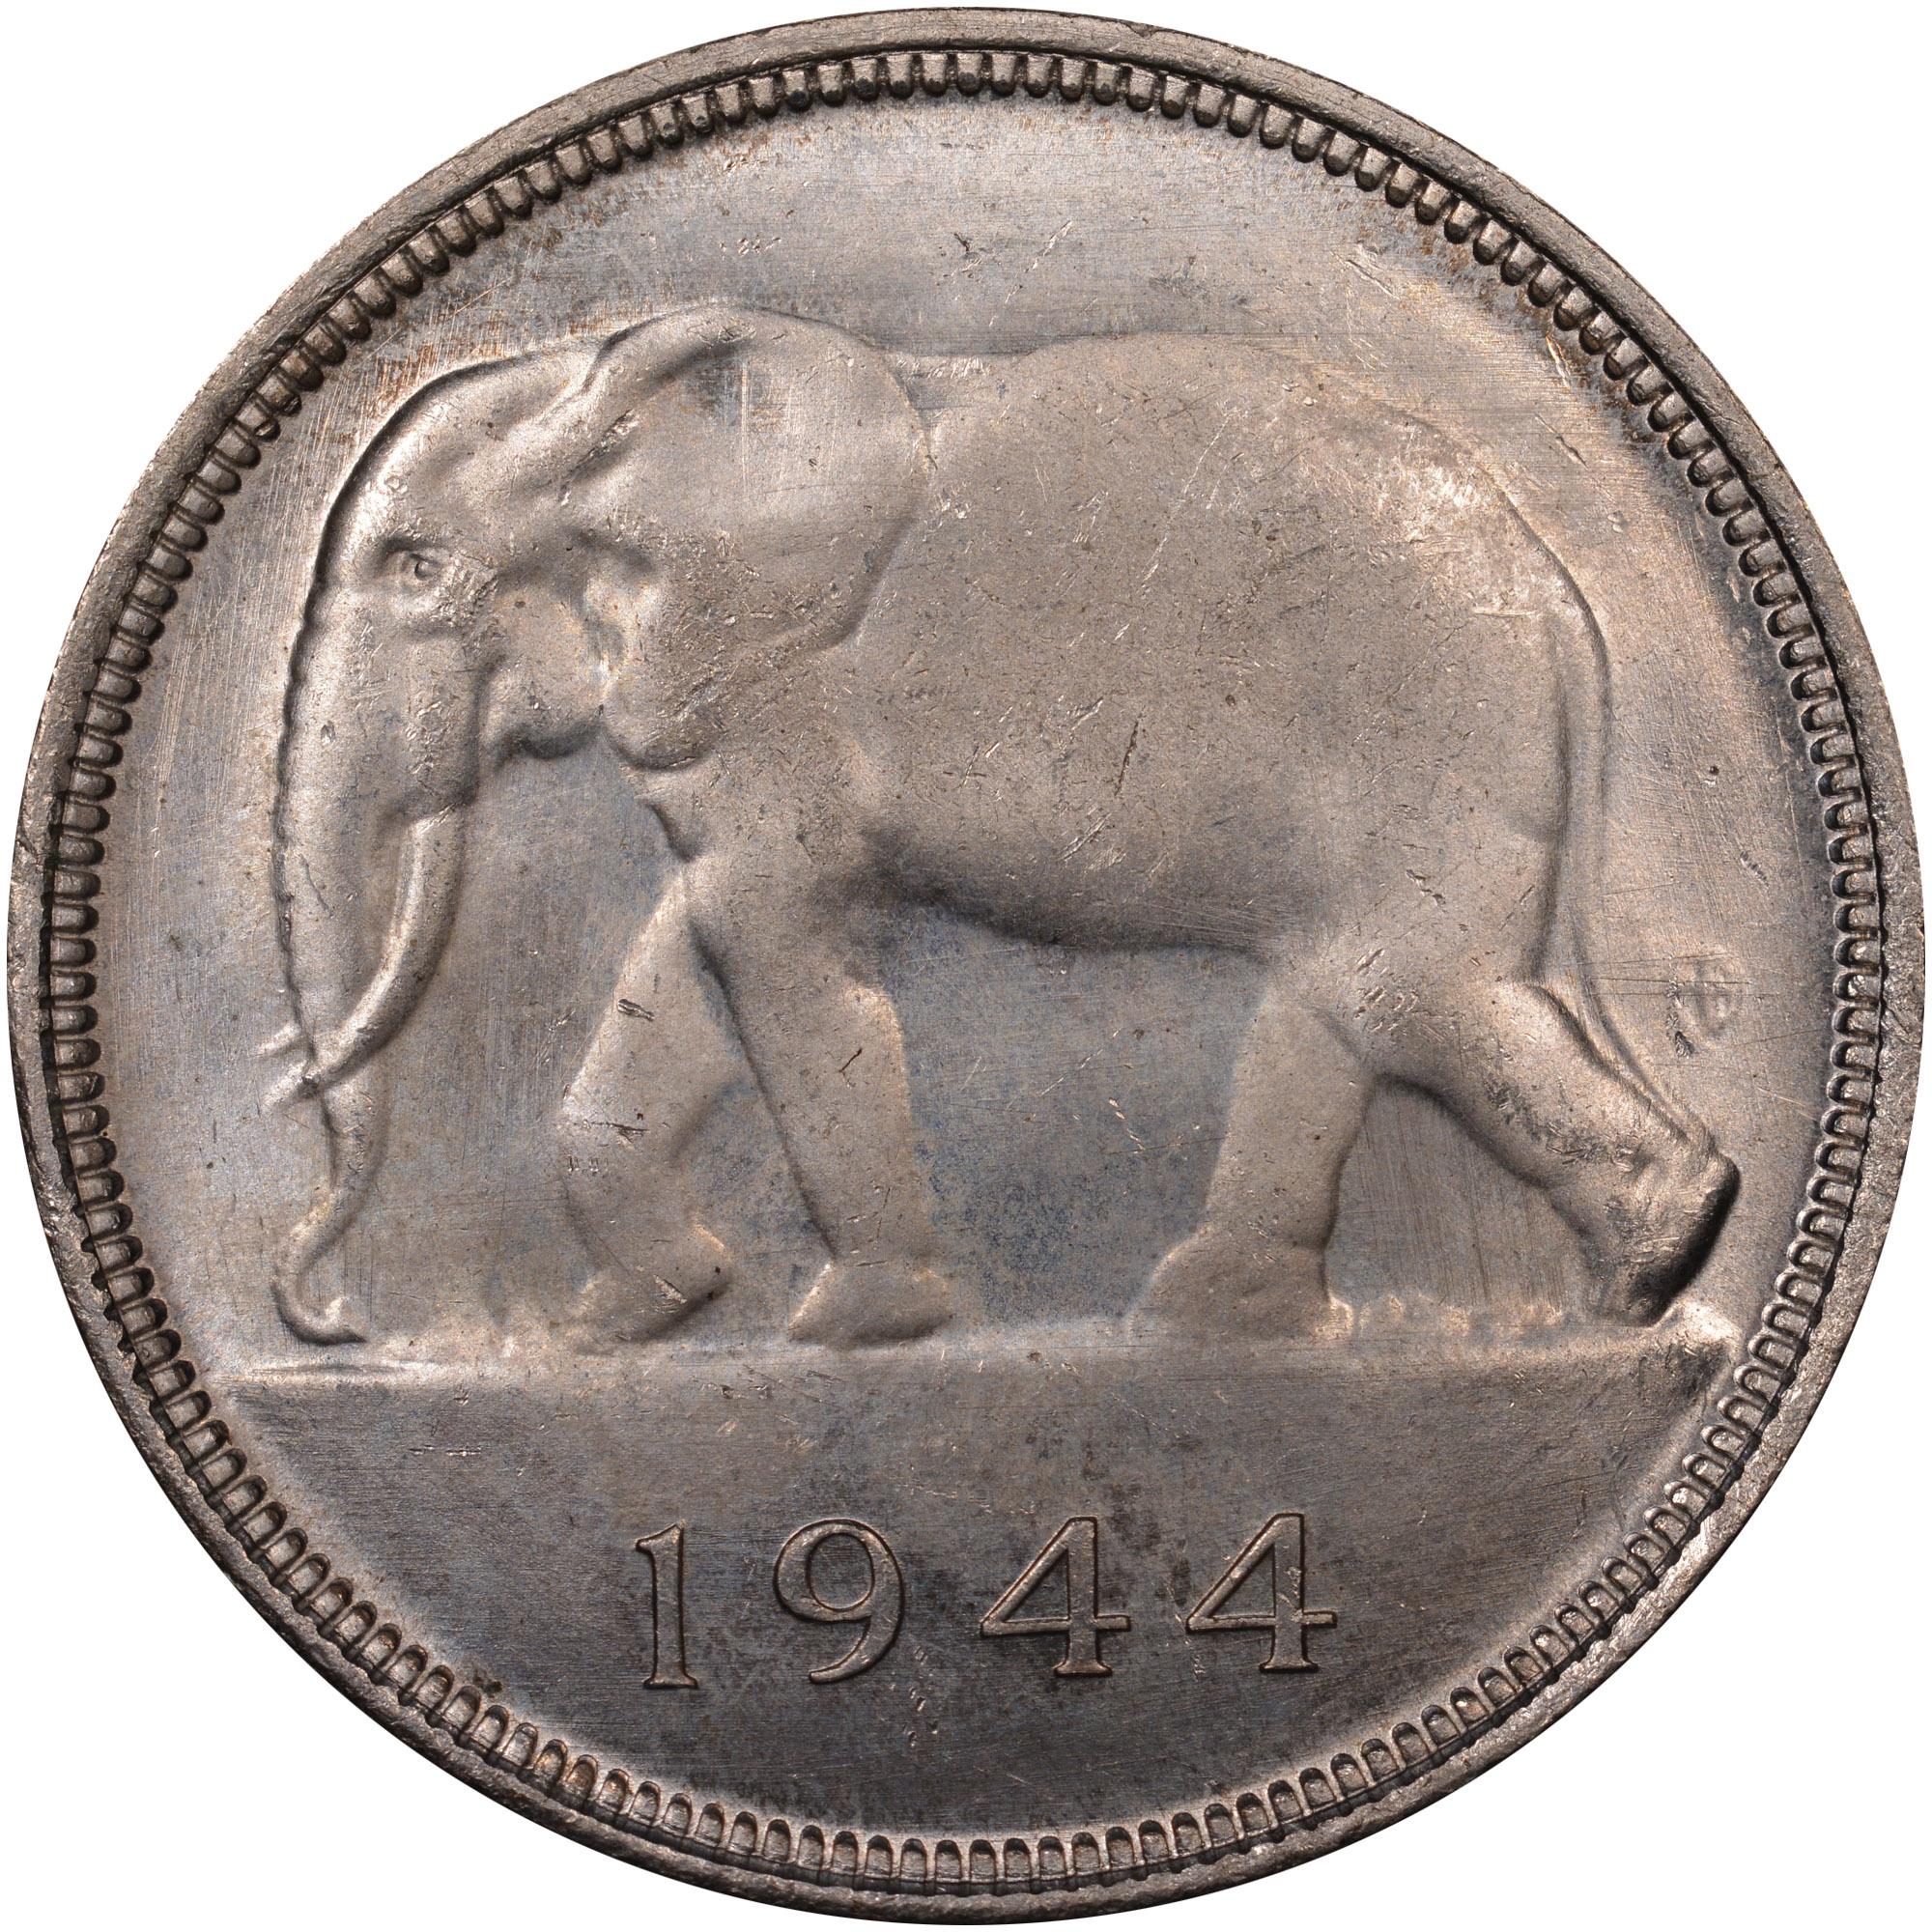 1944 Belgian Congo 50 Francs reverse